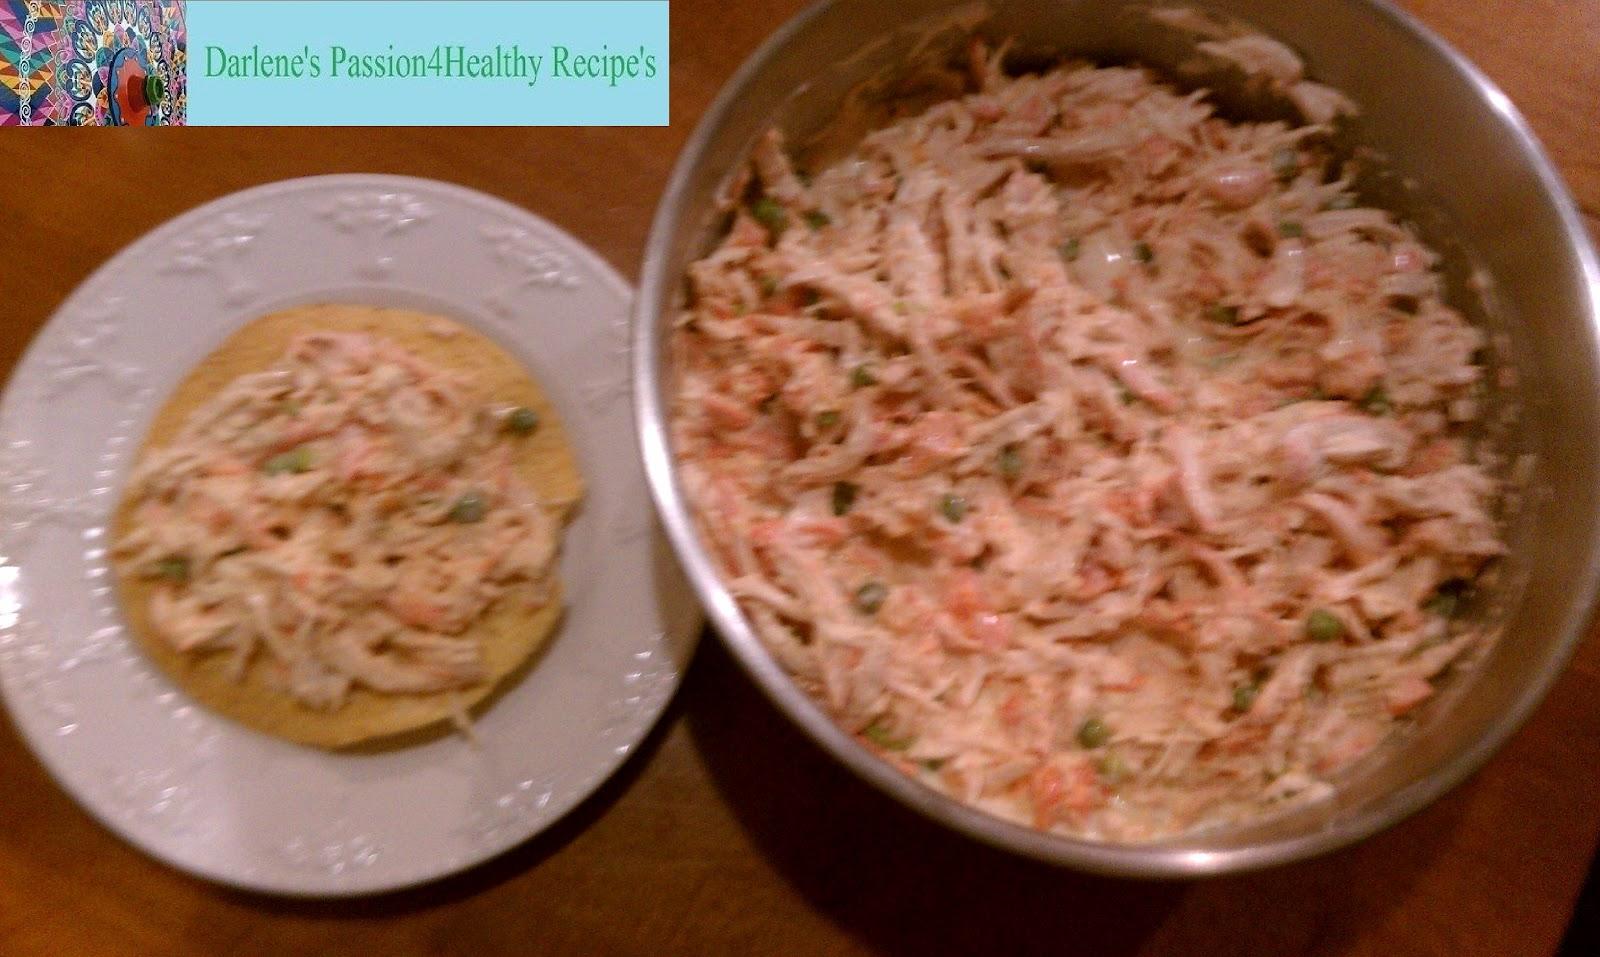 Darlene's Passion4Healthy Recipes: Chicken Salad Tostada